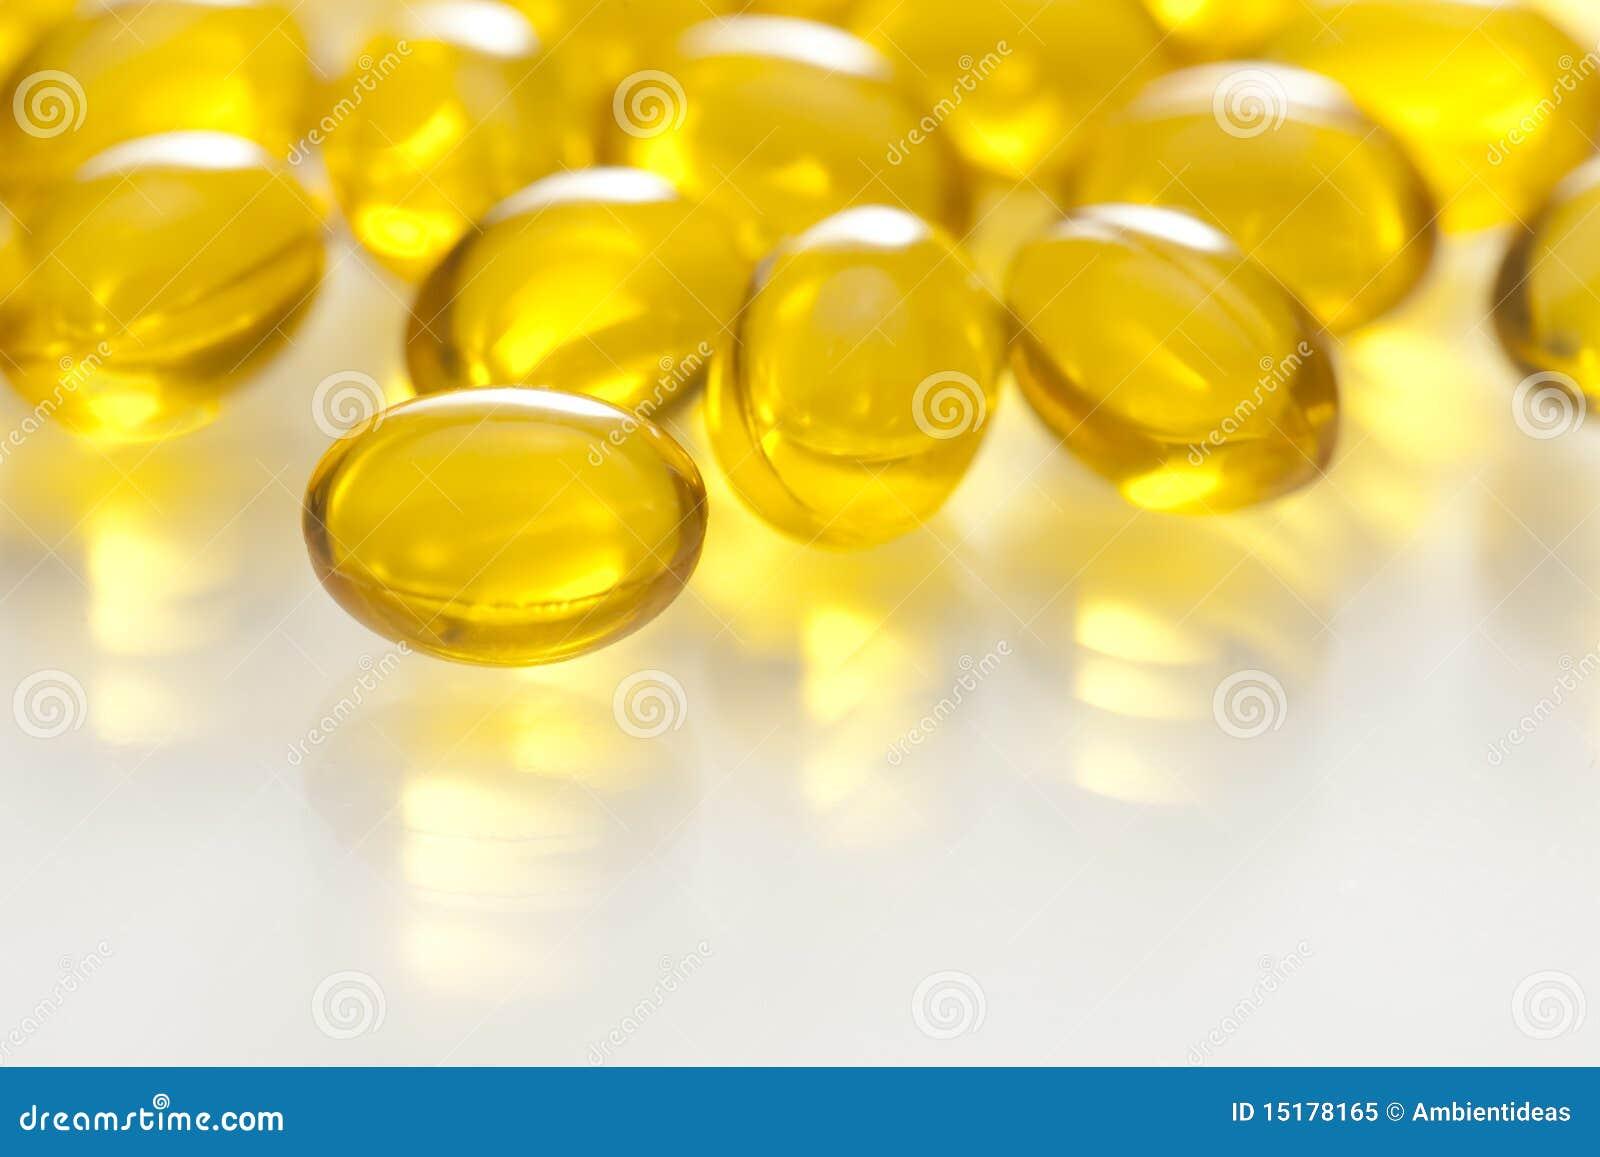 Yellow Gel Capsule Pill Royalty Free Stock Photo - Image